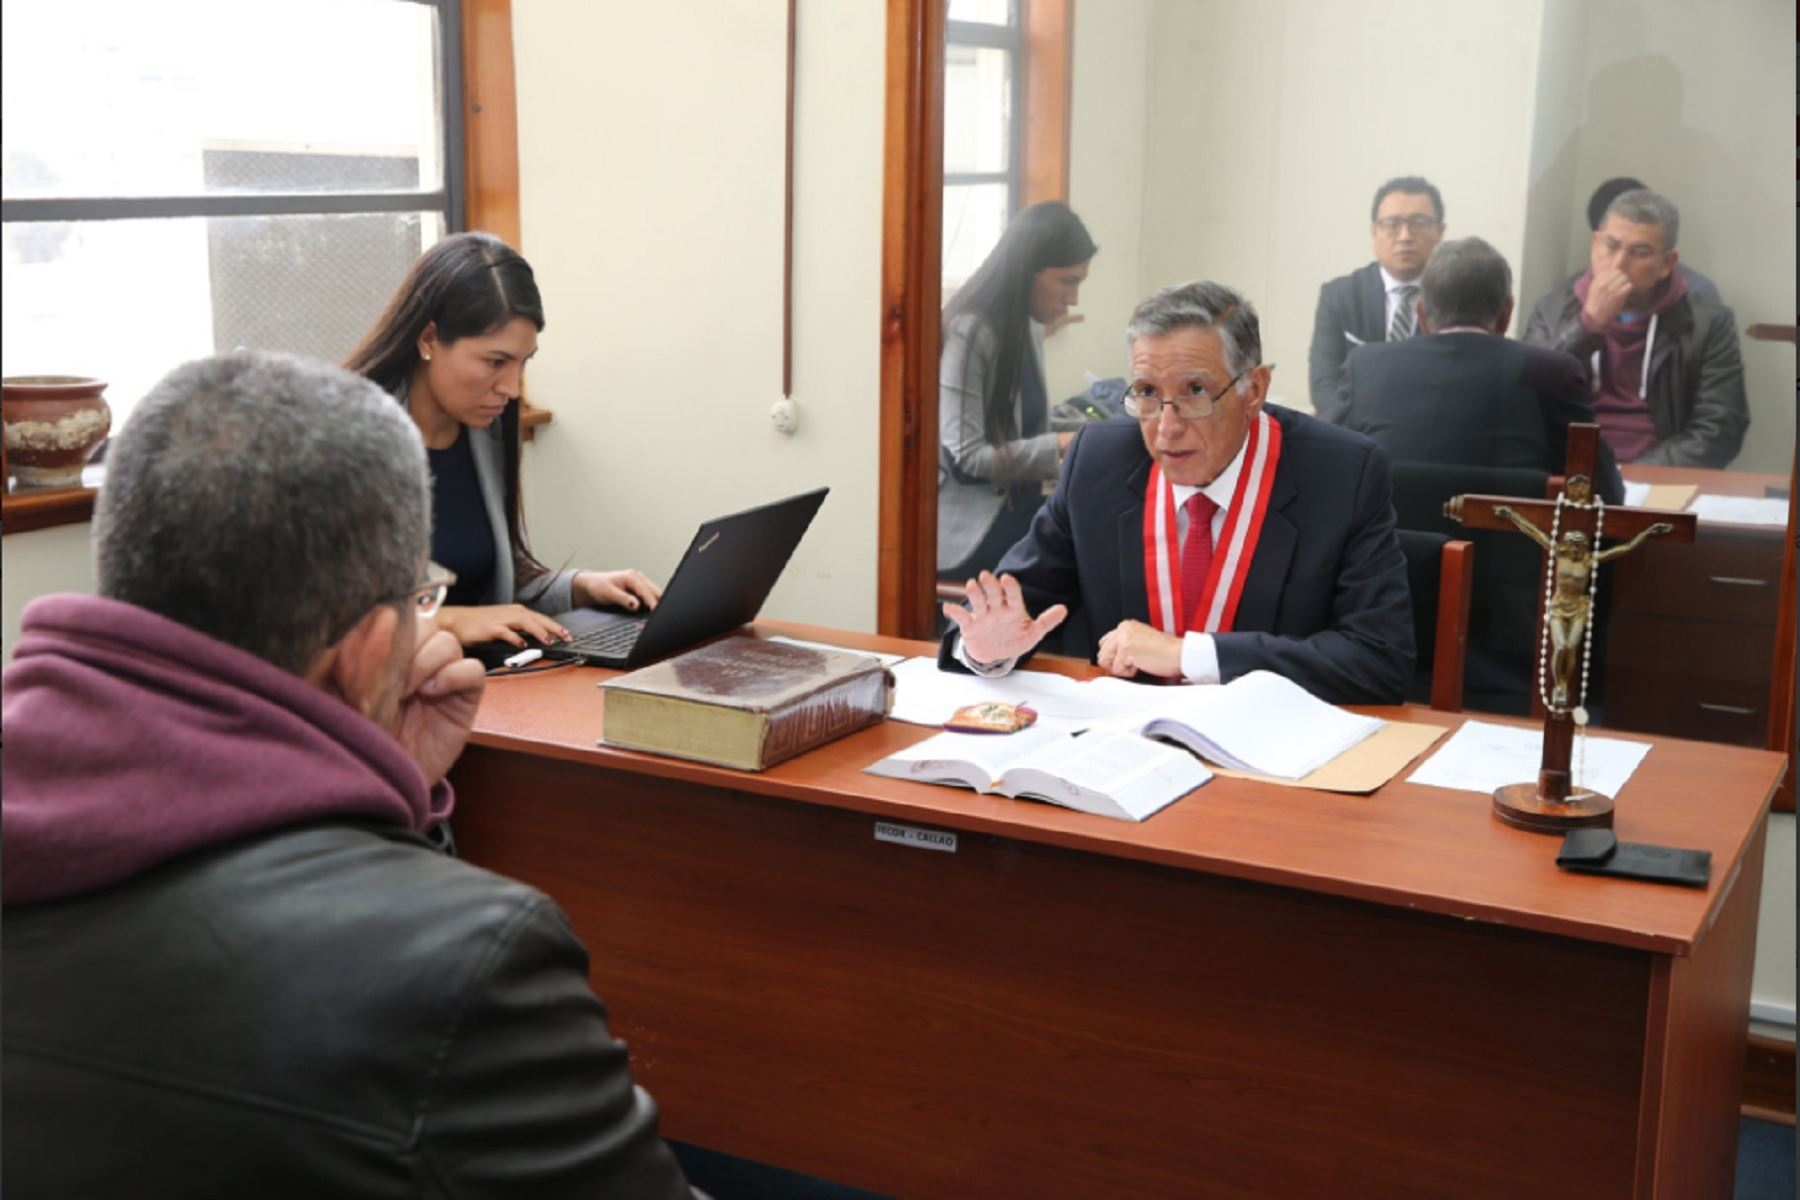 Juez Luis Cevallos Vegas renunció al Poder Judicial